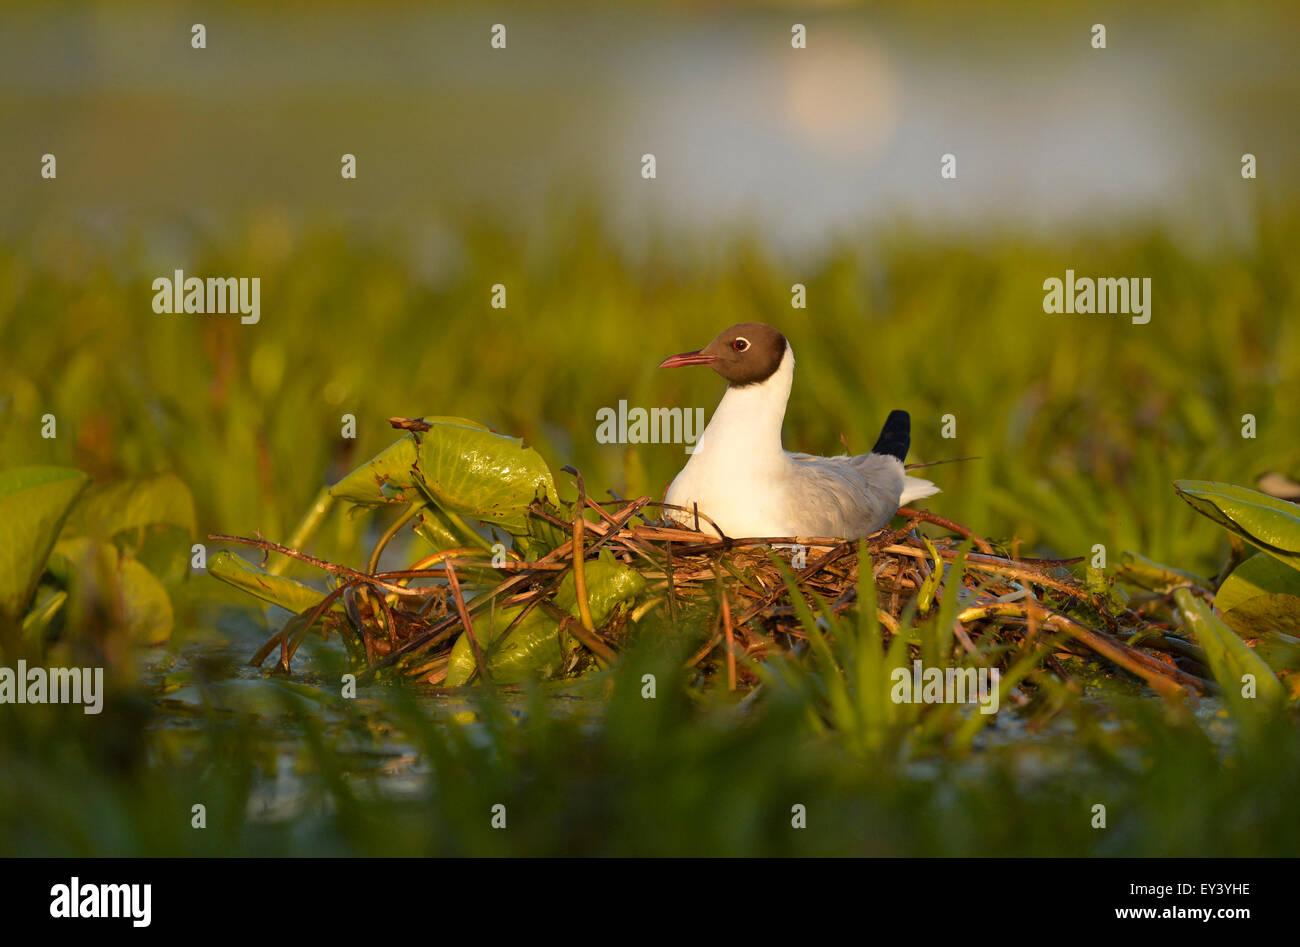 Black-headed Gull (Larus ridibundus) adult in breeding plumage, sitting on nest, Danube delta, Romania, May Stock Photo